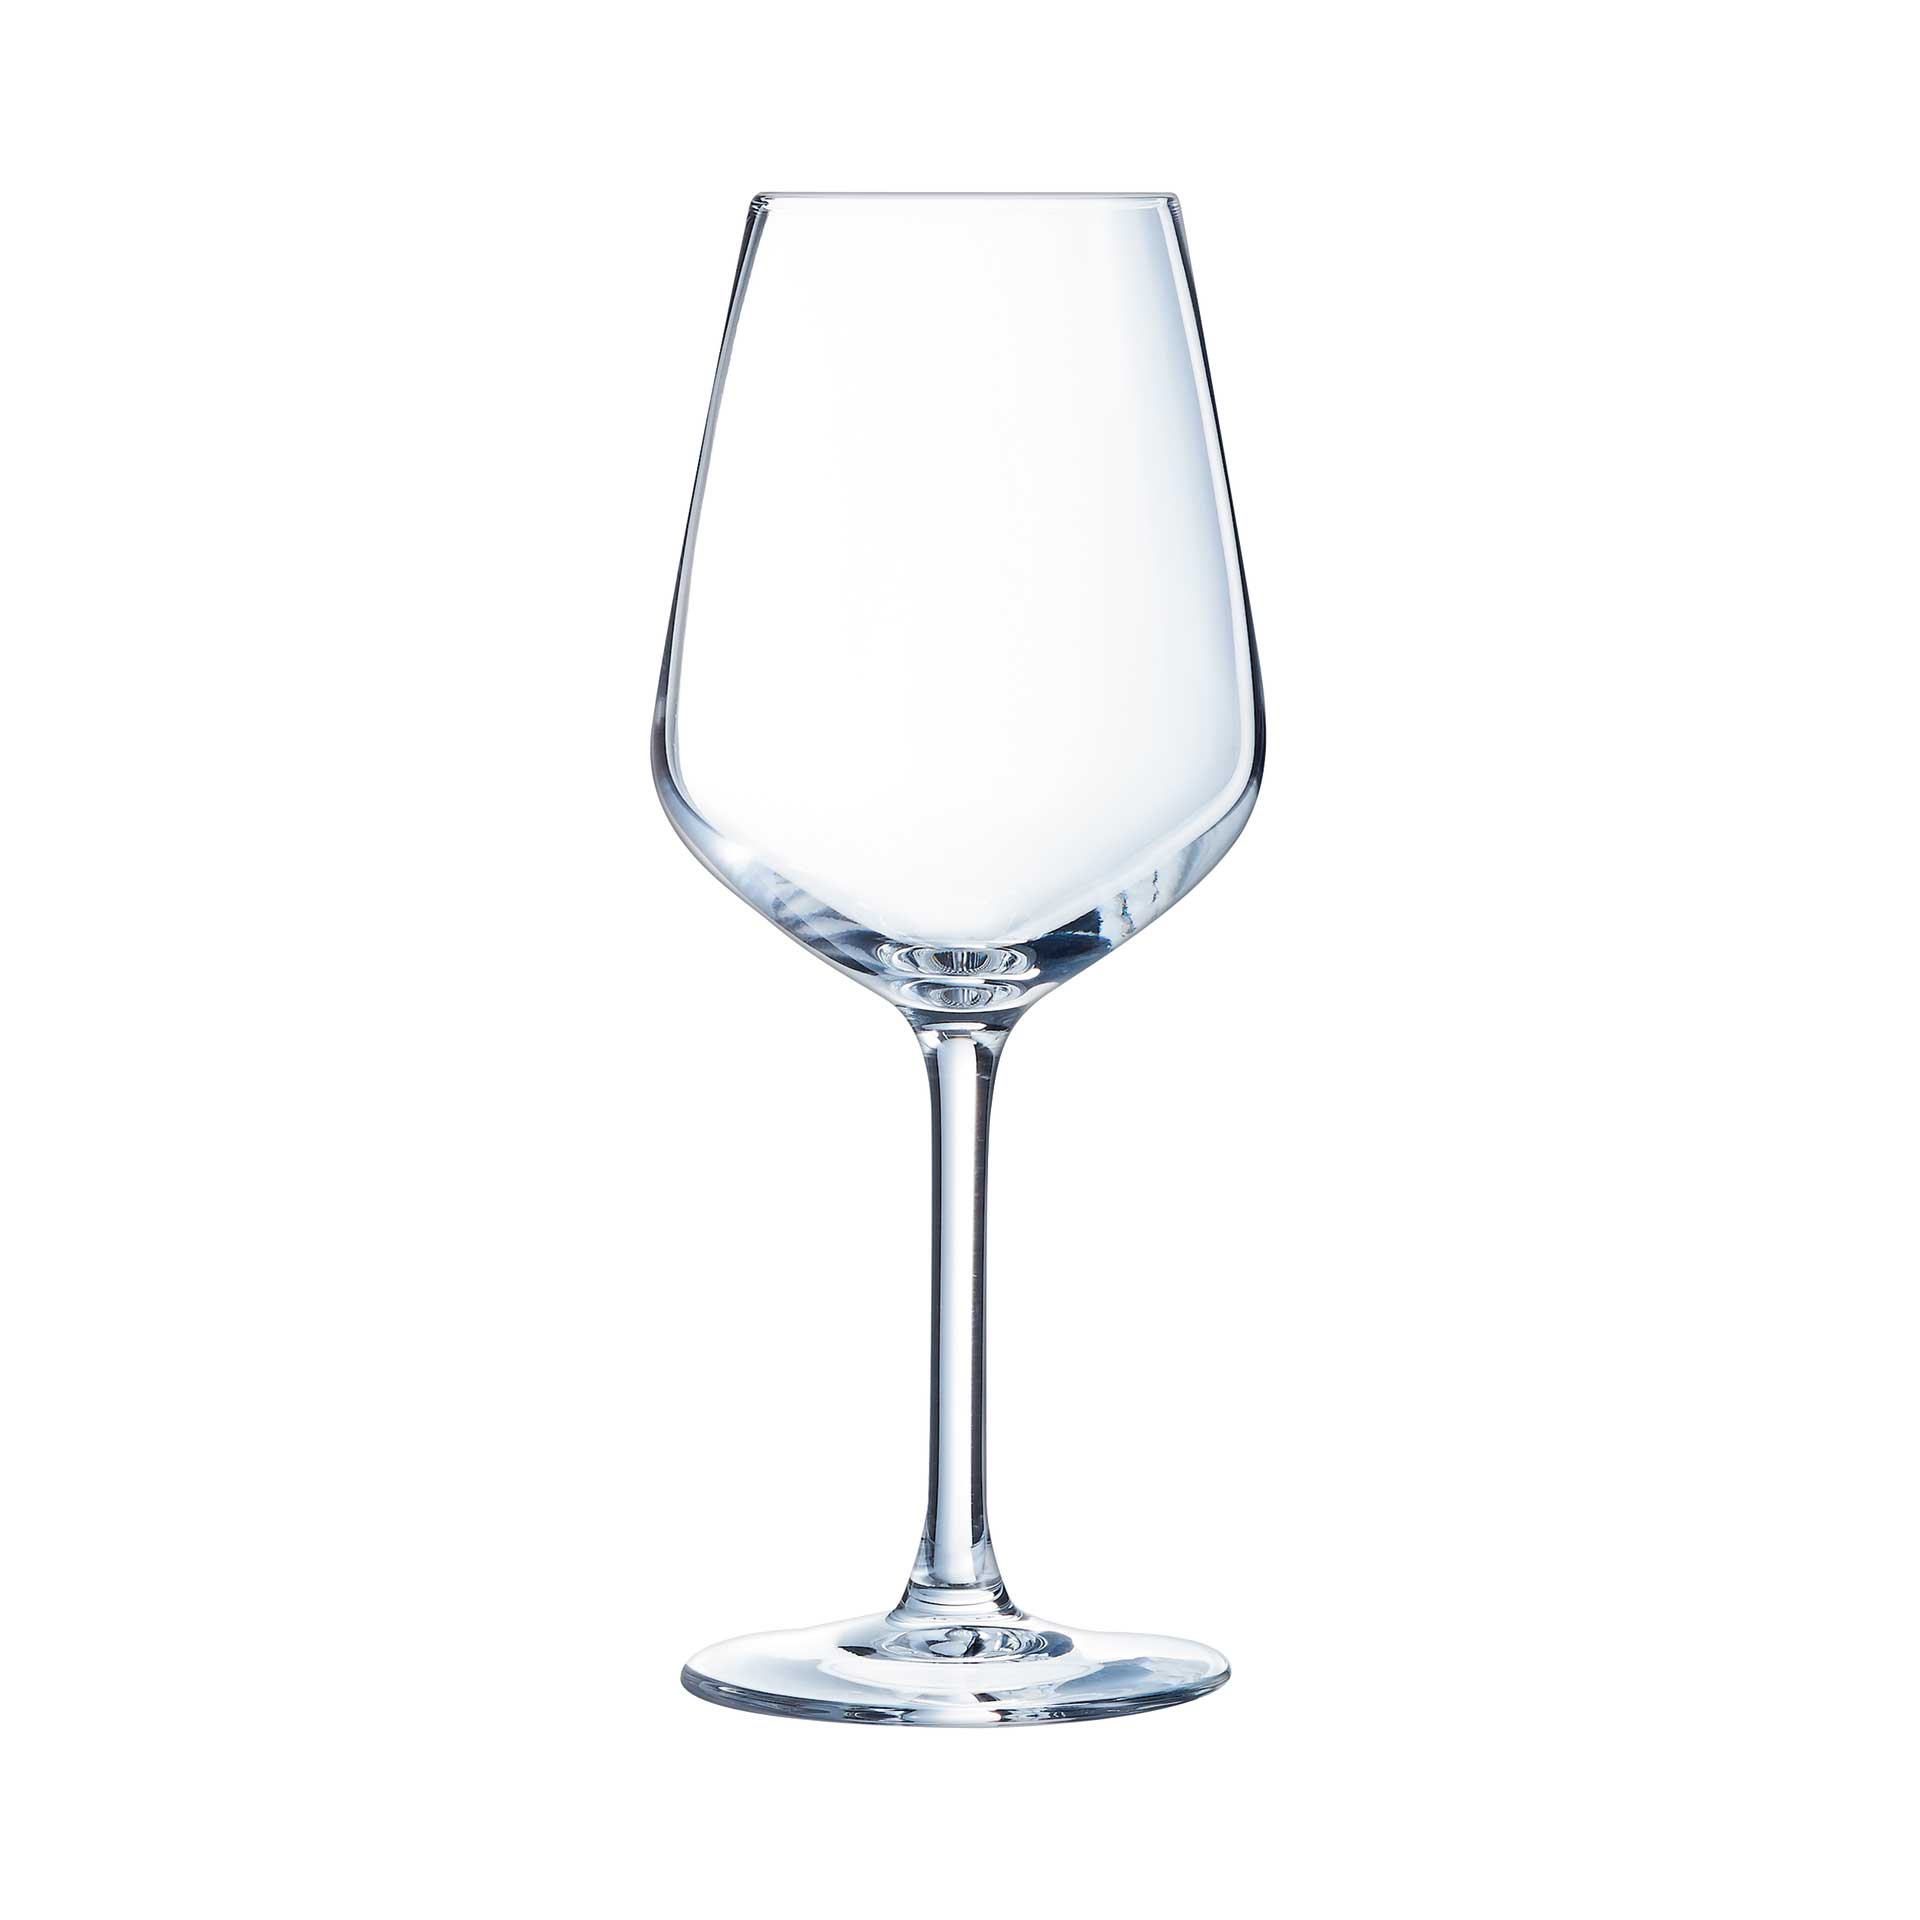 Cardinal N5163 glass, wine